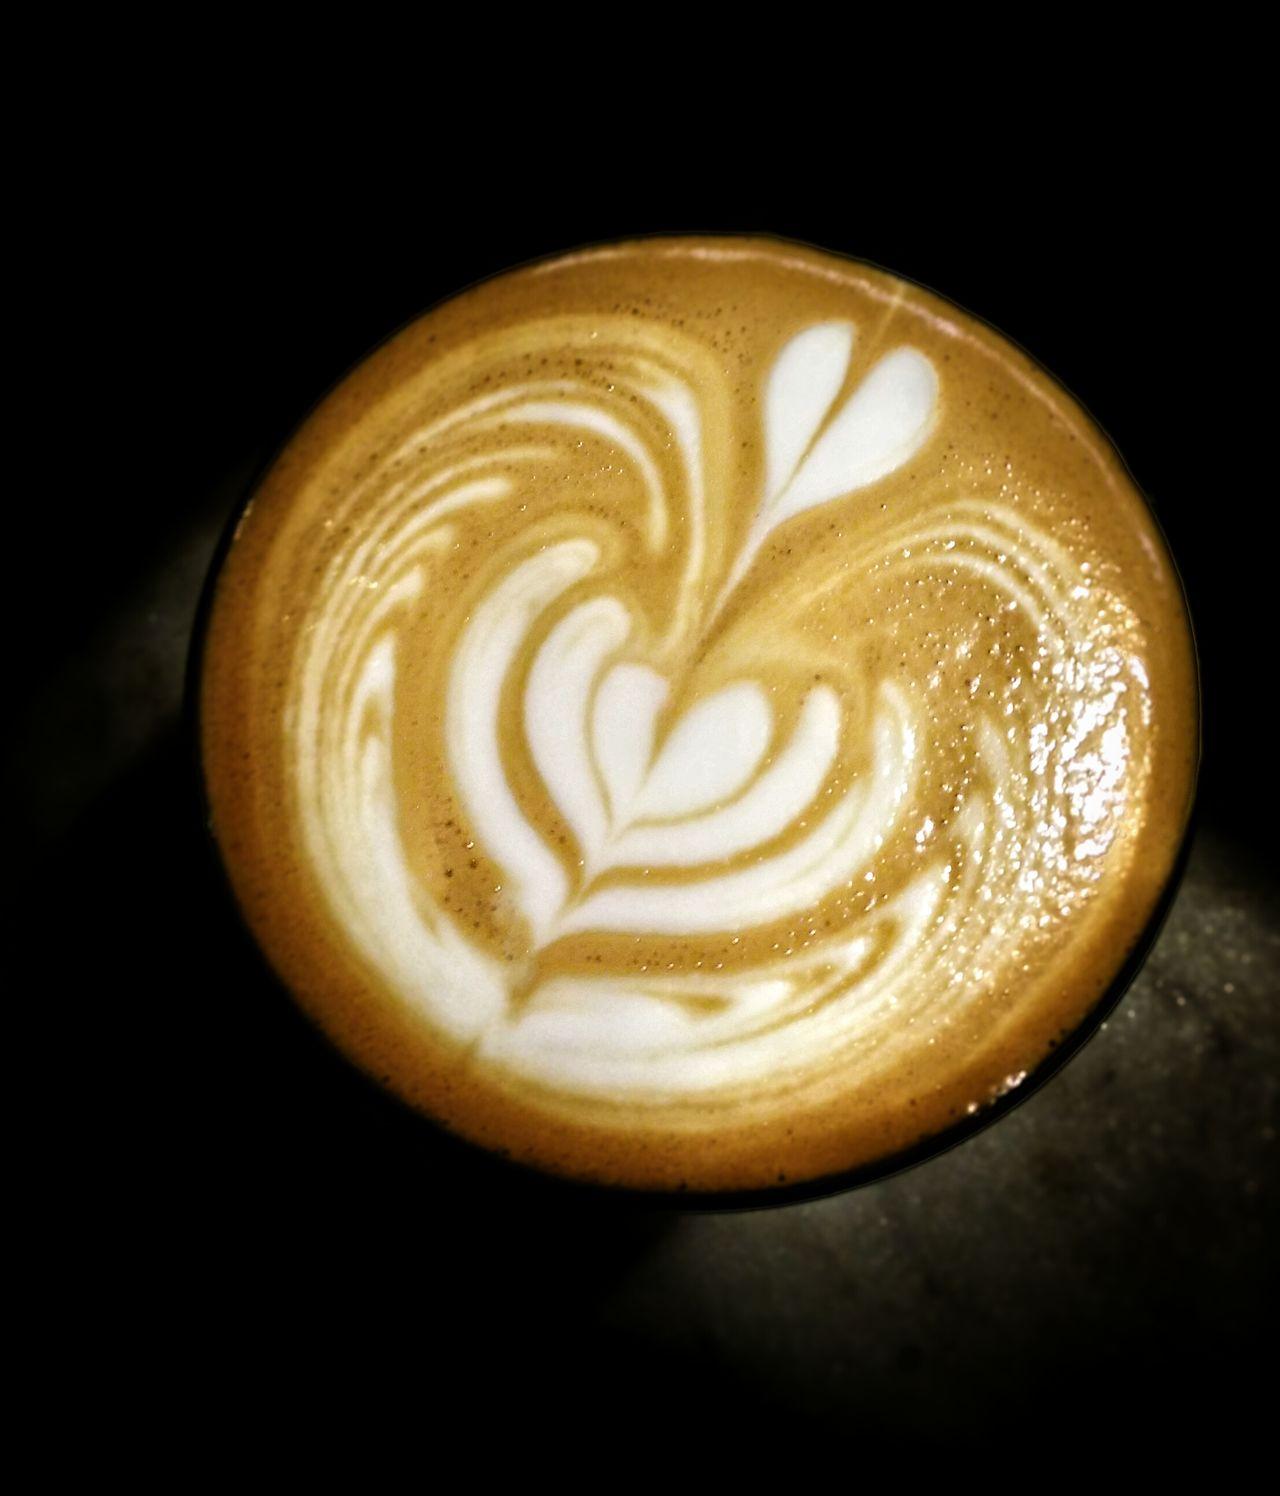 Cortado. Art by me. Cofee Cofee Time Cortado Latte Art Pour Tulip Layers Cafe Barista Barista Life Espresso Milk Stumptown Coffee